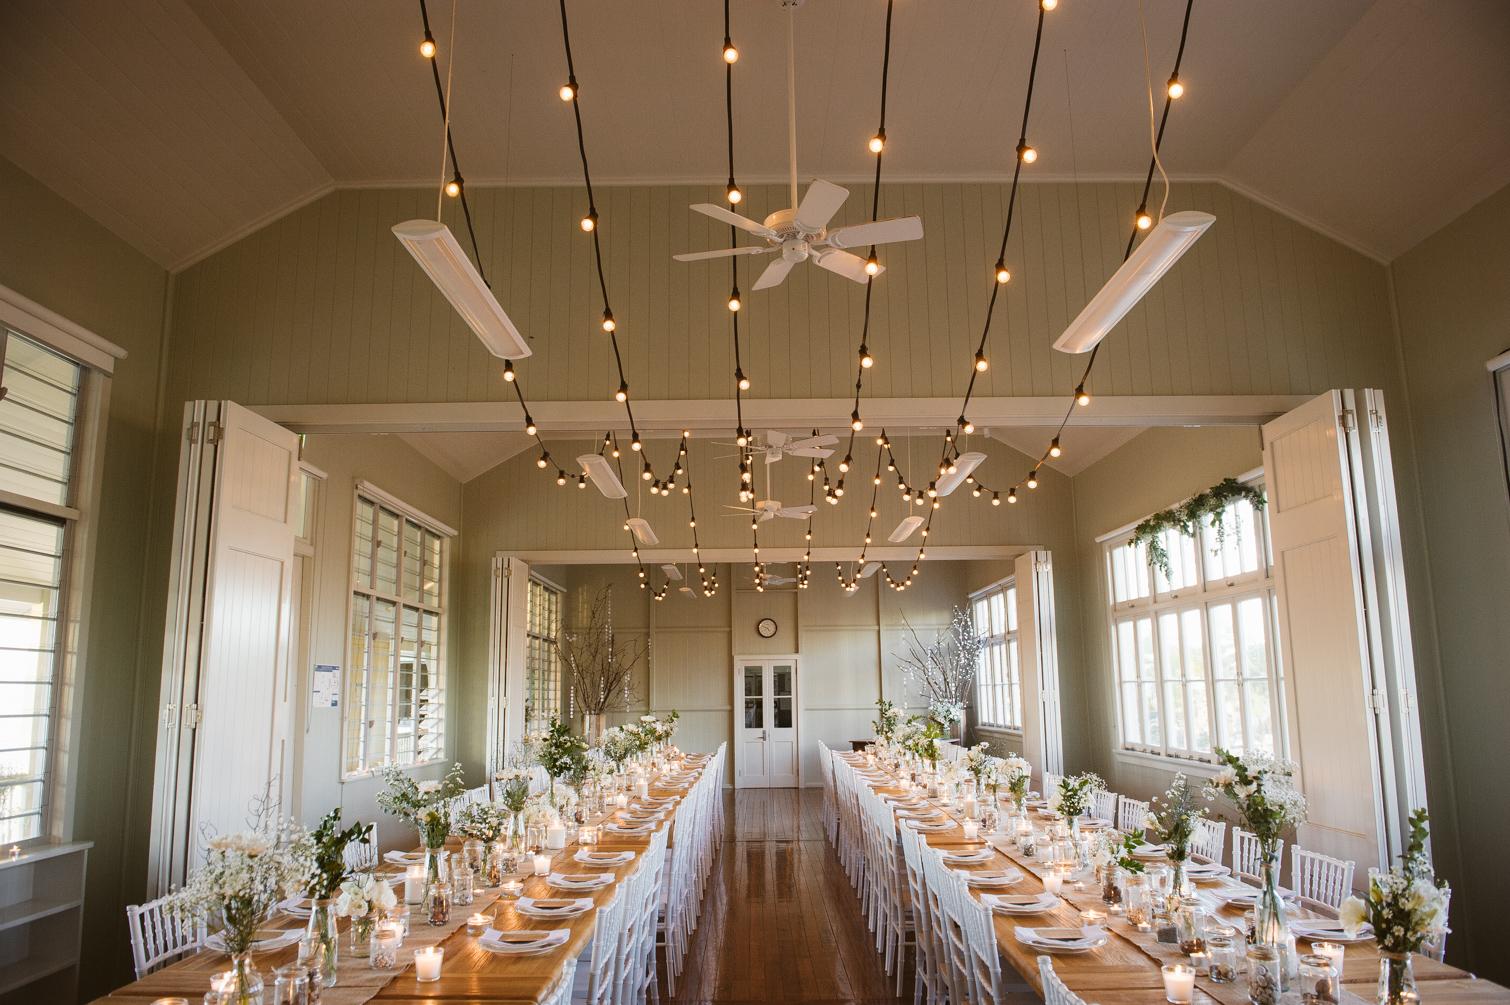 Kirra_Hill-Community_Centre_Wedding_Venue-32.jpg